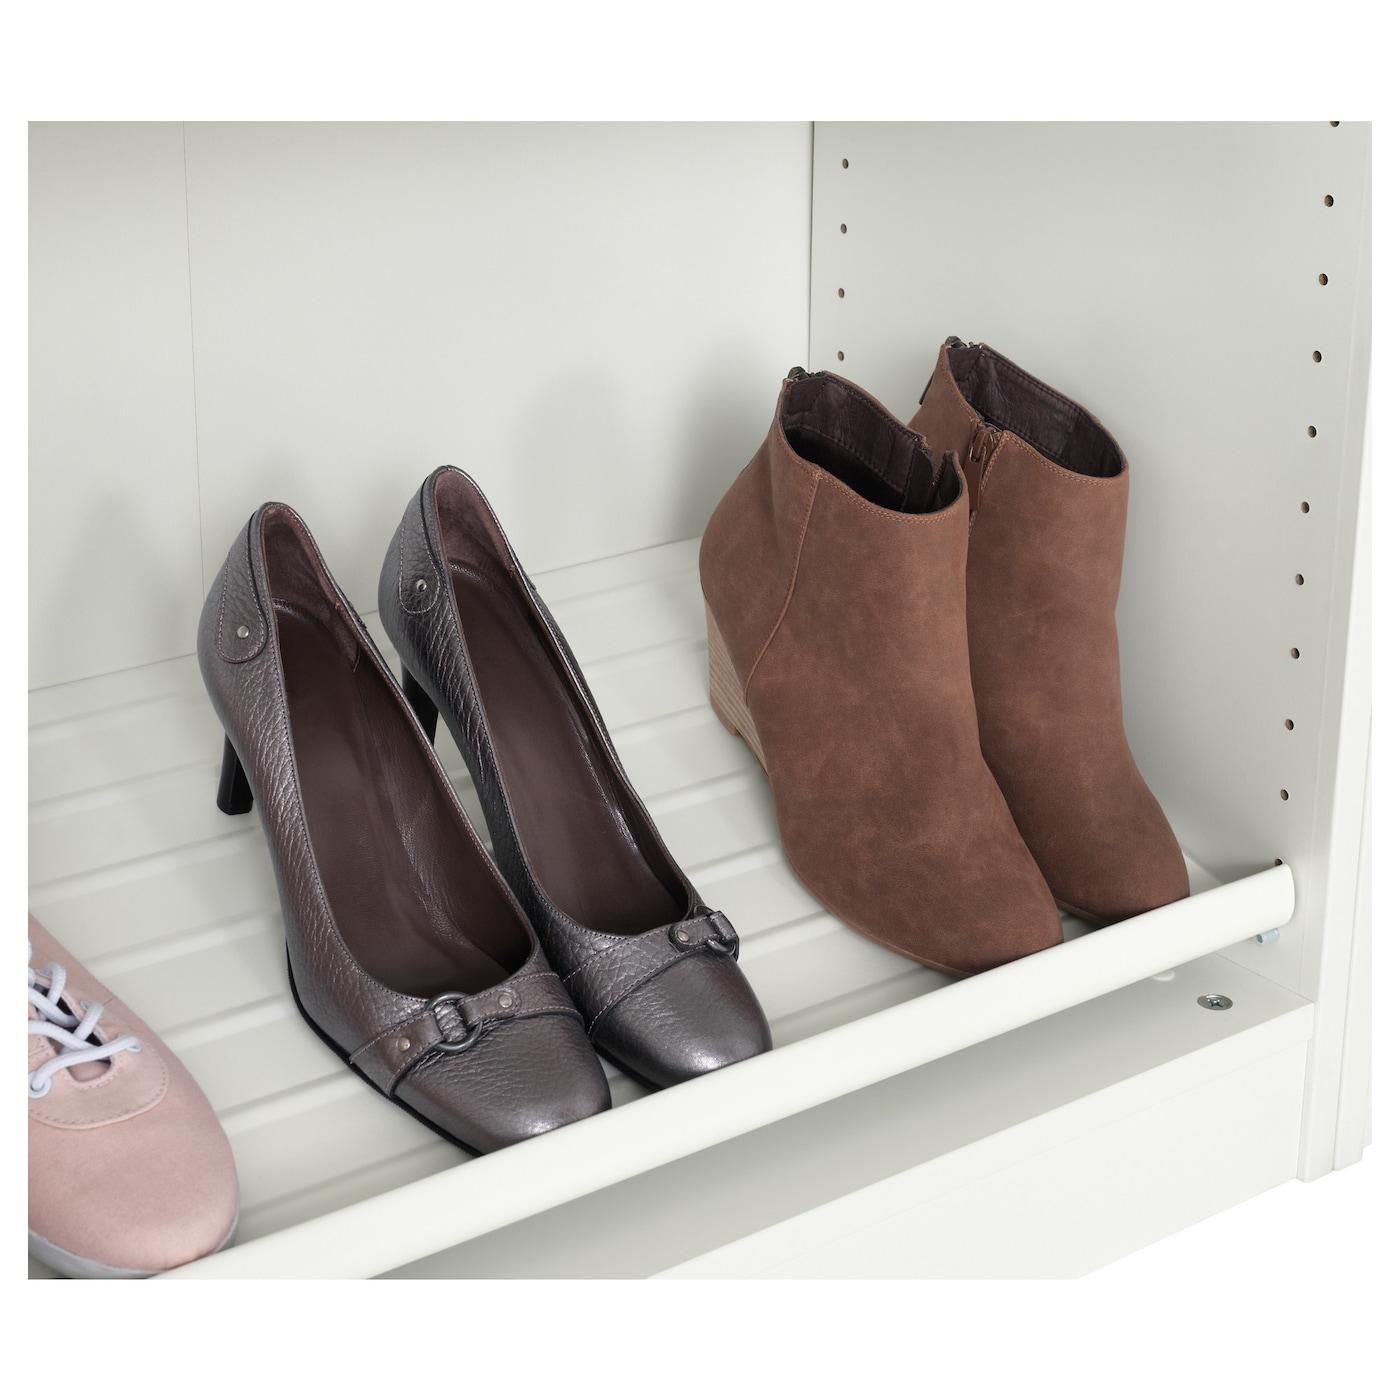 Komplement shoe shelf white 100x35 cm ikea for Ikea pax schuhregal